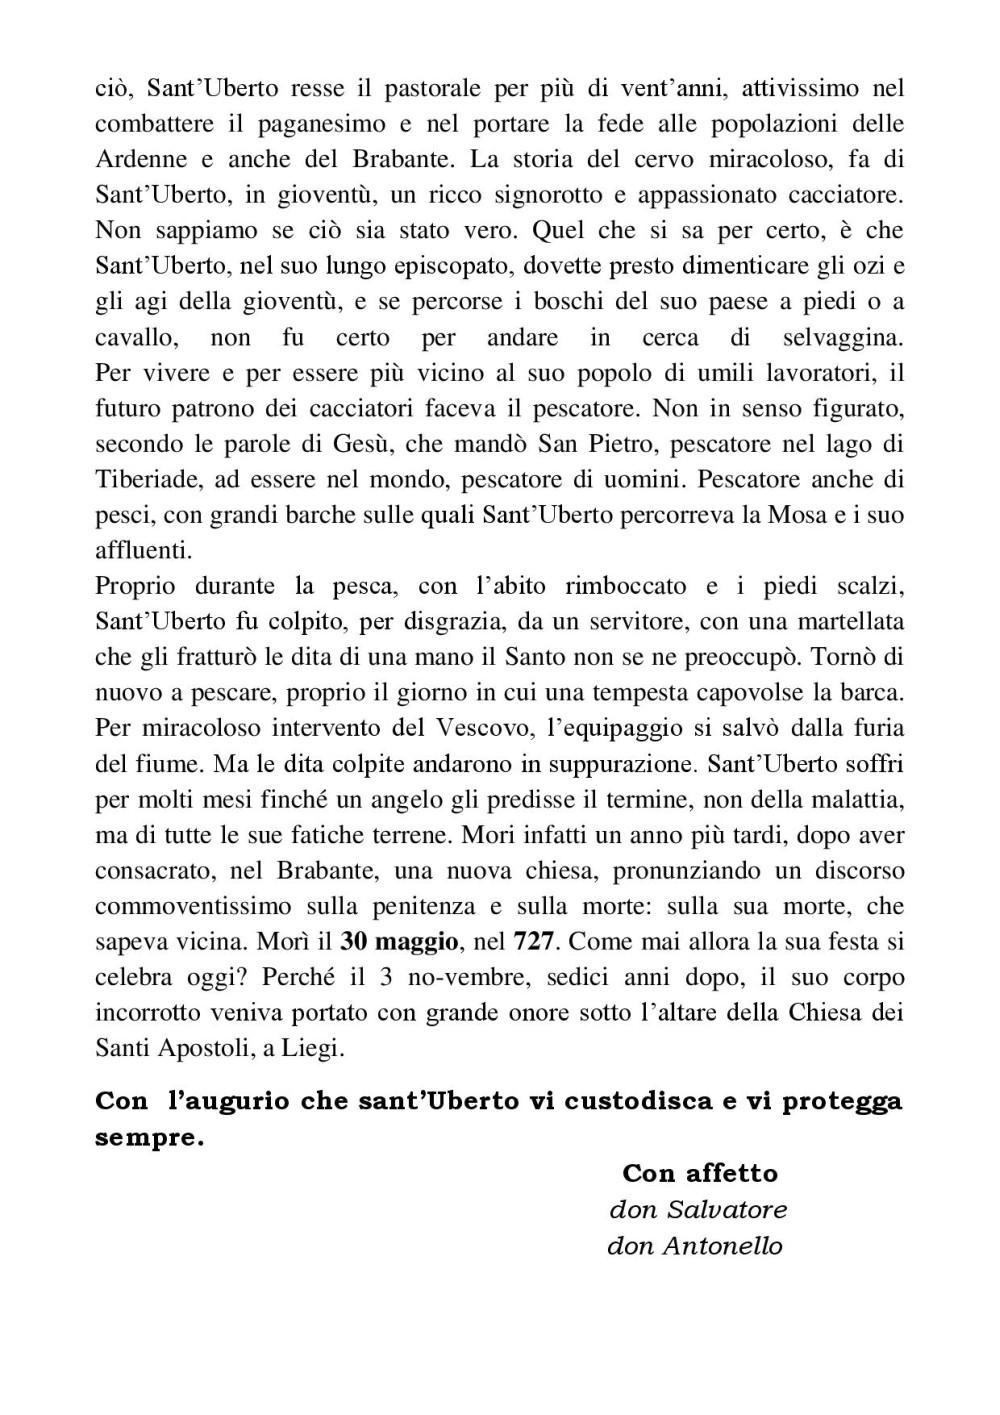 Vita di San Uberto, pagina 3